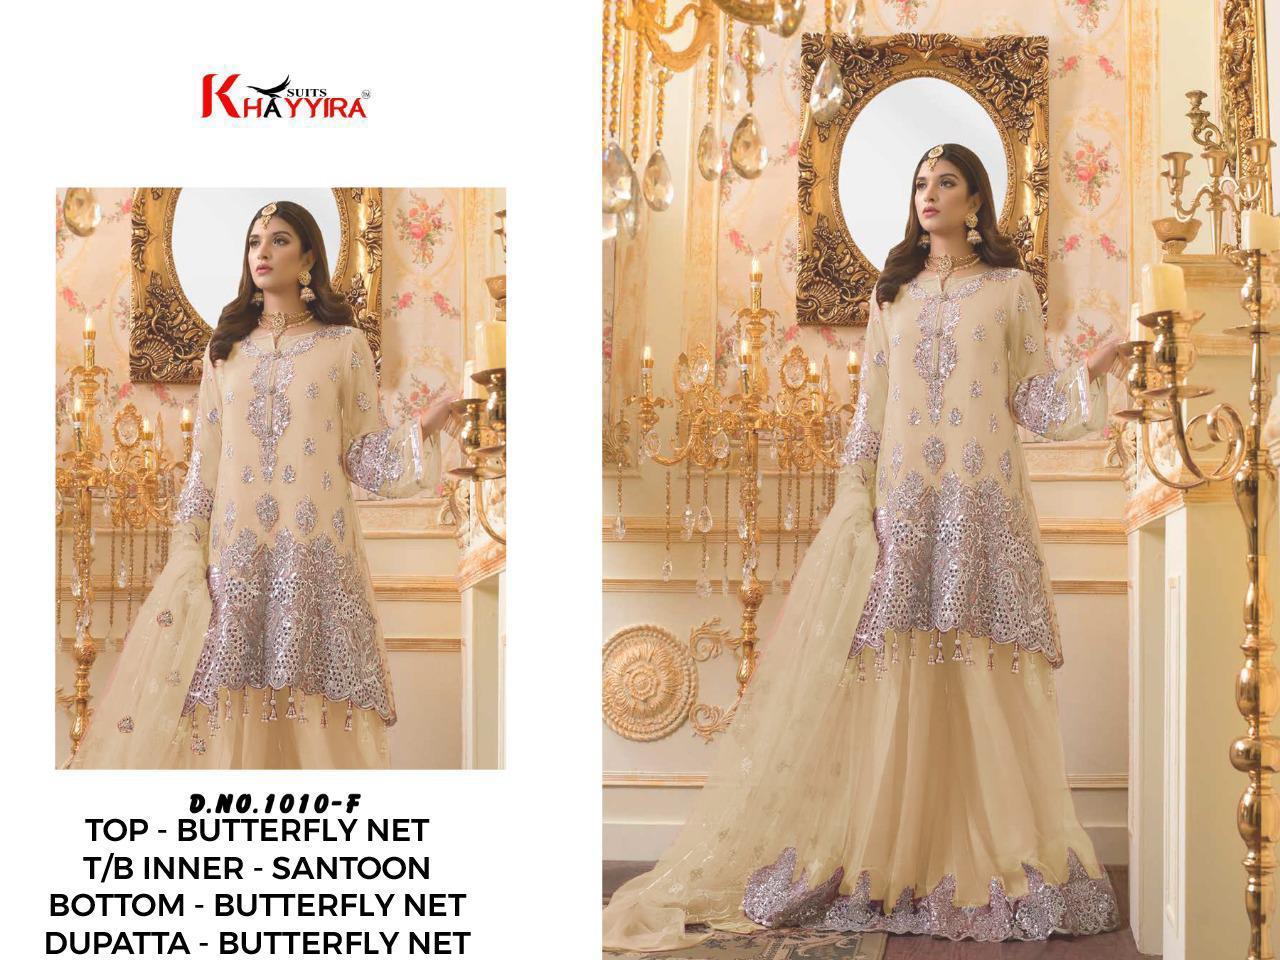 Khayyira Suits Dn-1010 Designer Butterfly Net Suit